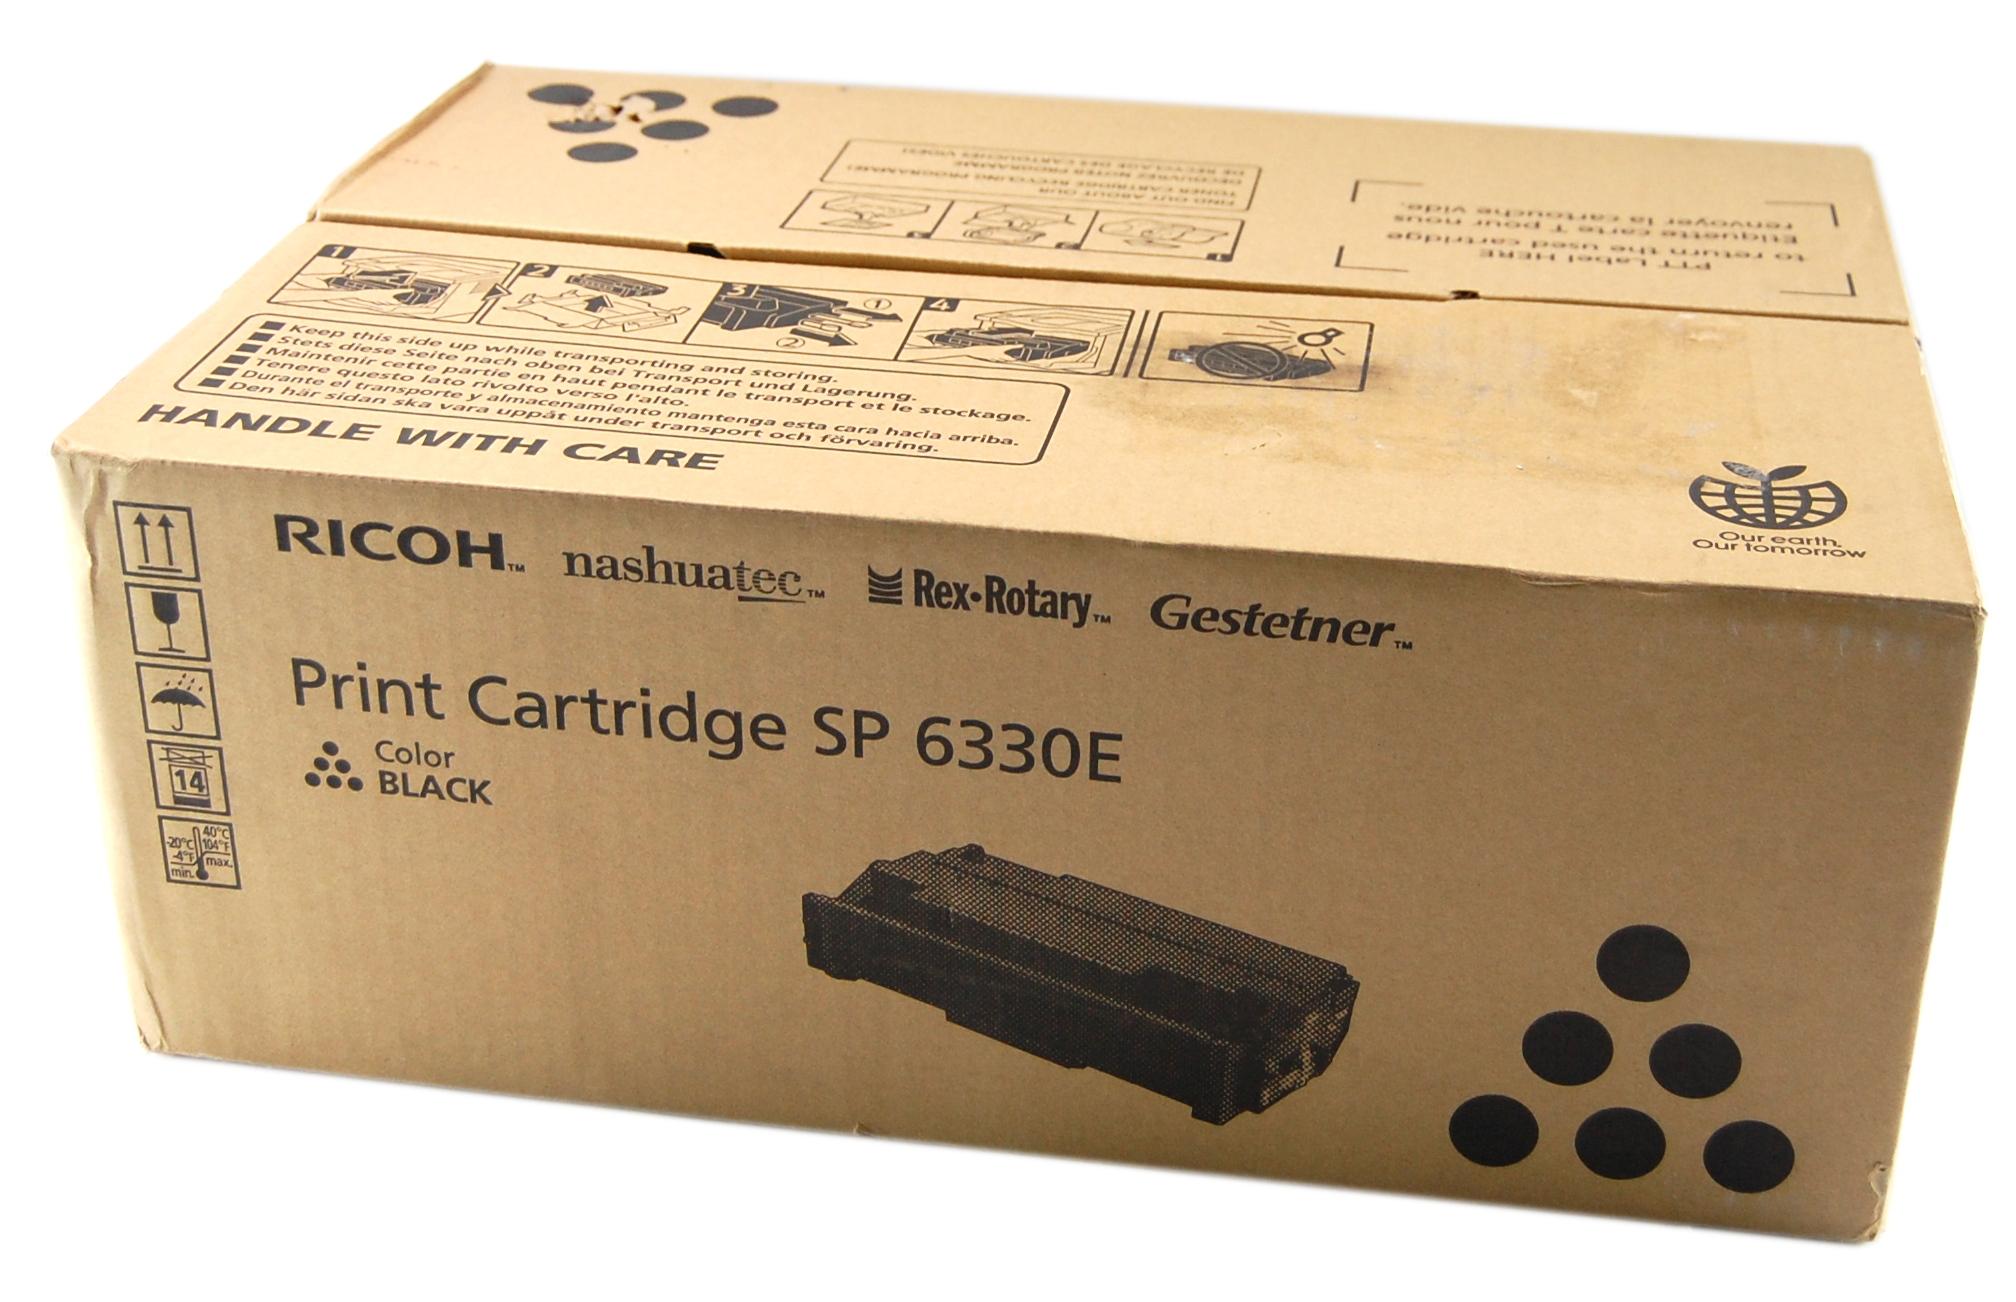 New Ricoh G296-35 Print Cartridge SP 6330E Color Black